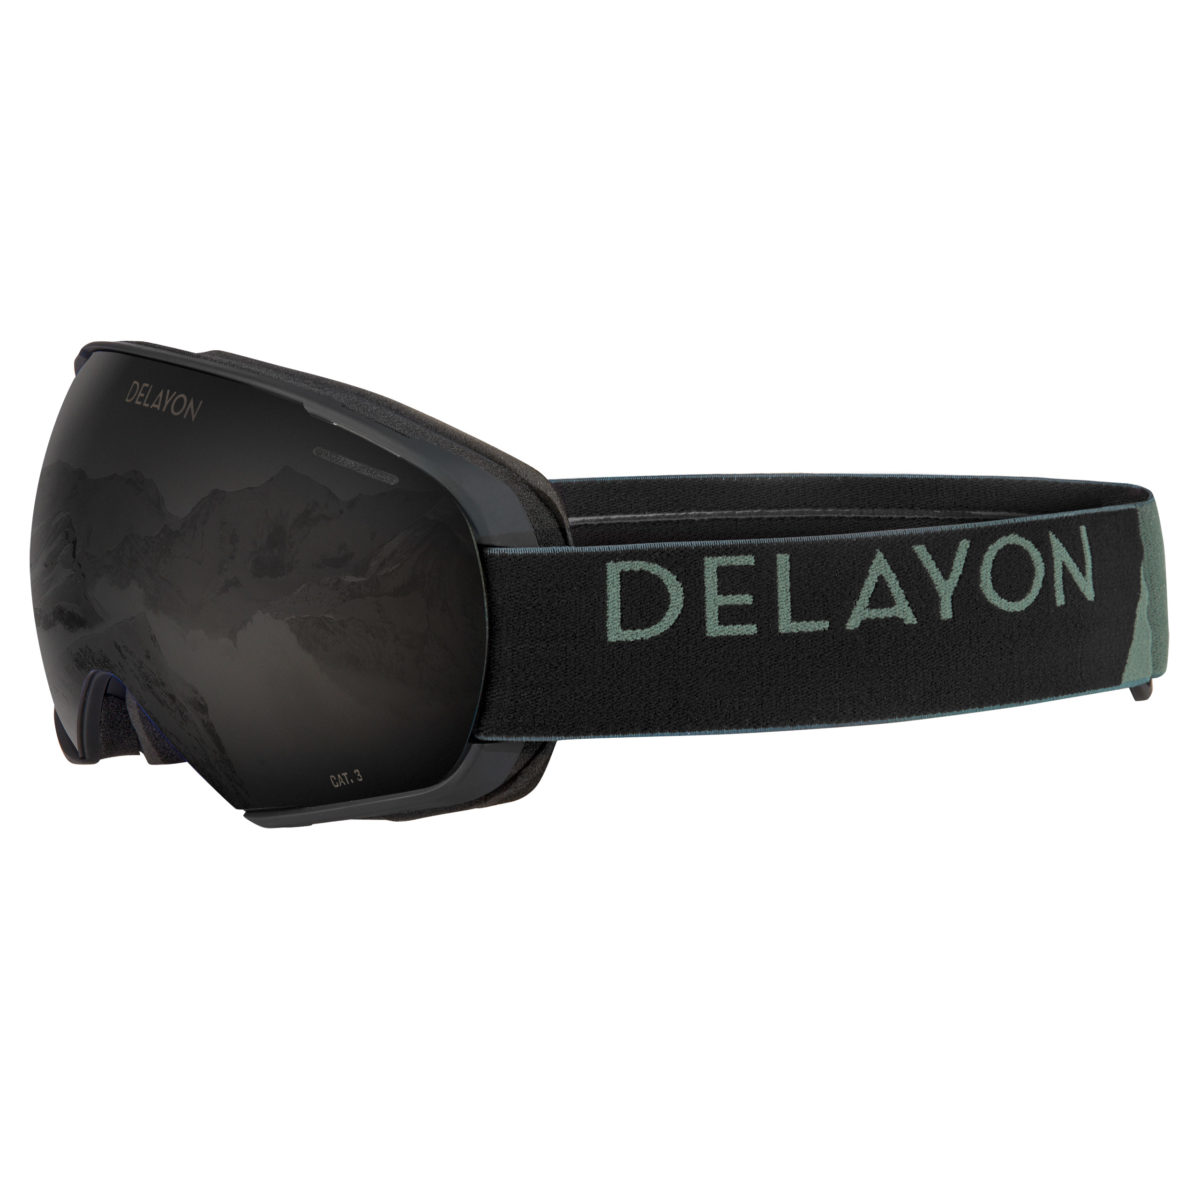 DELAYON Eyewear Puzzle Goggle Matte Black STRONG Black Front